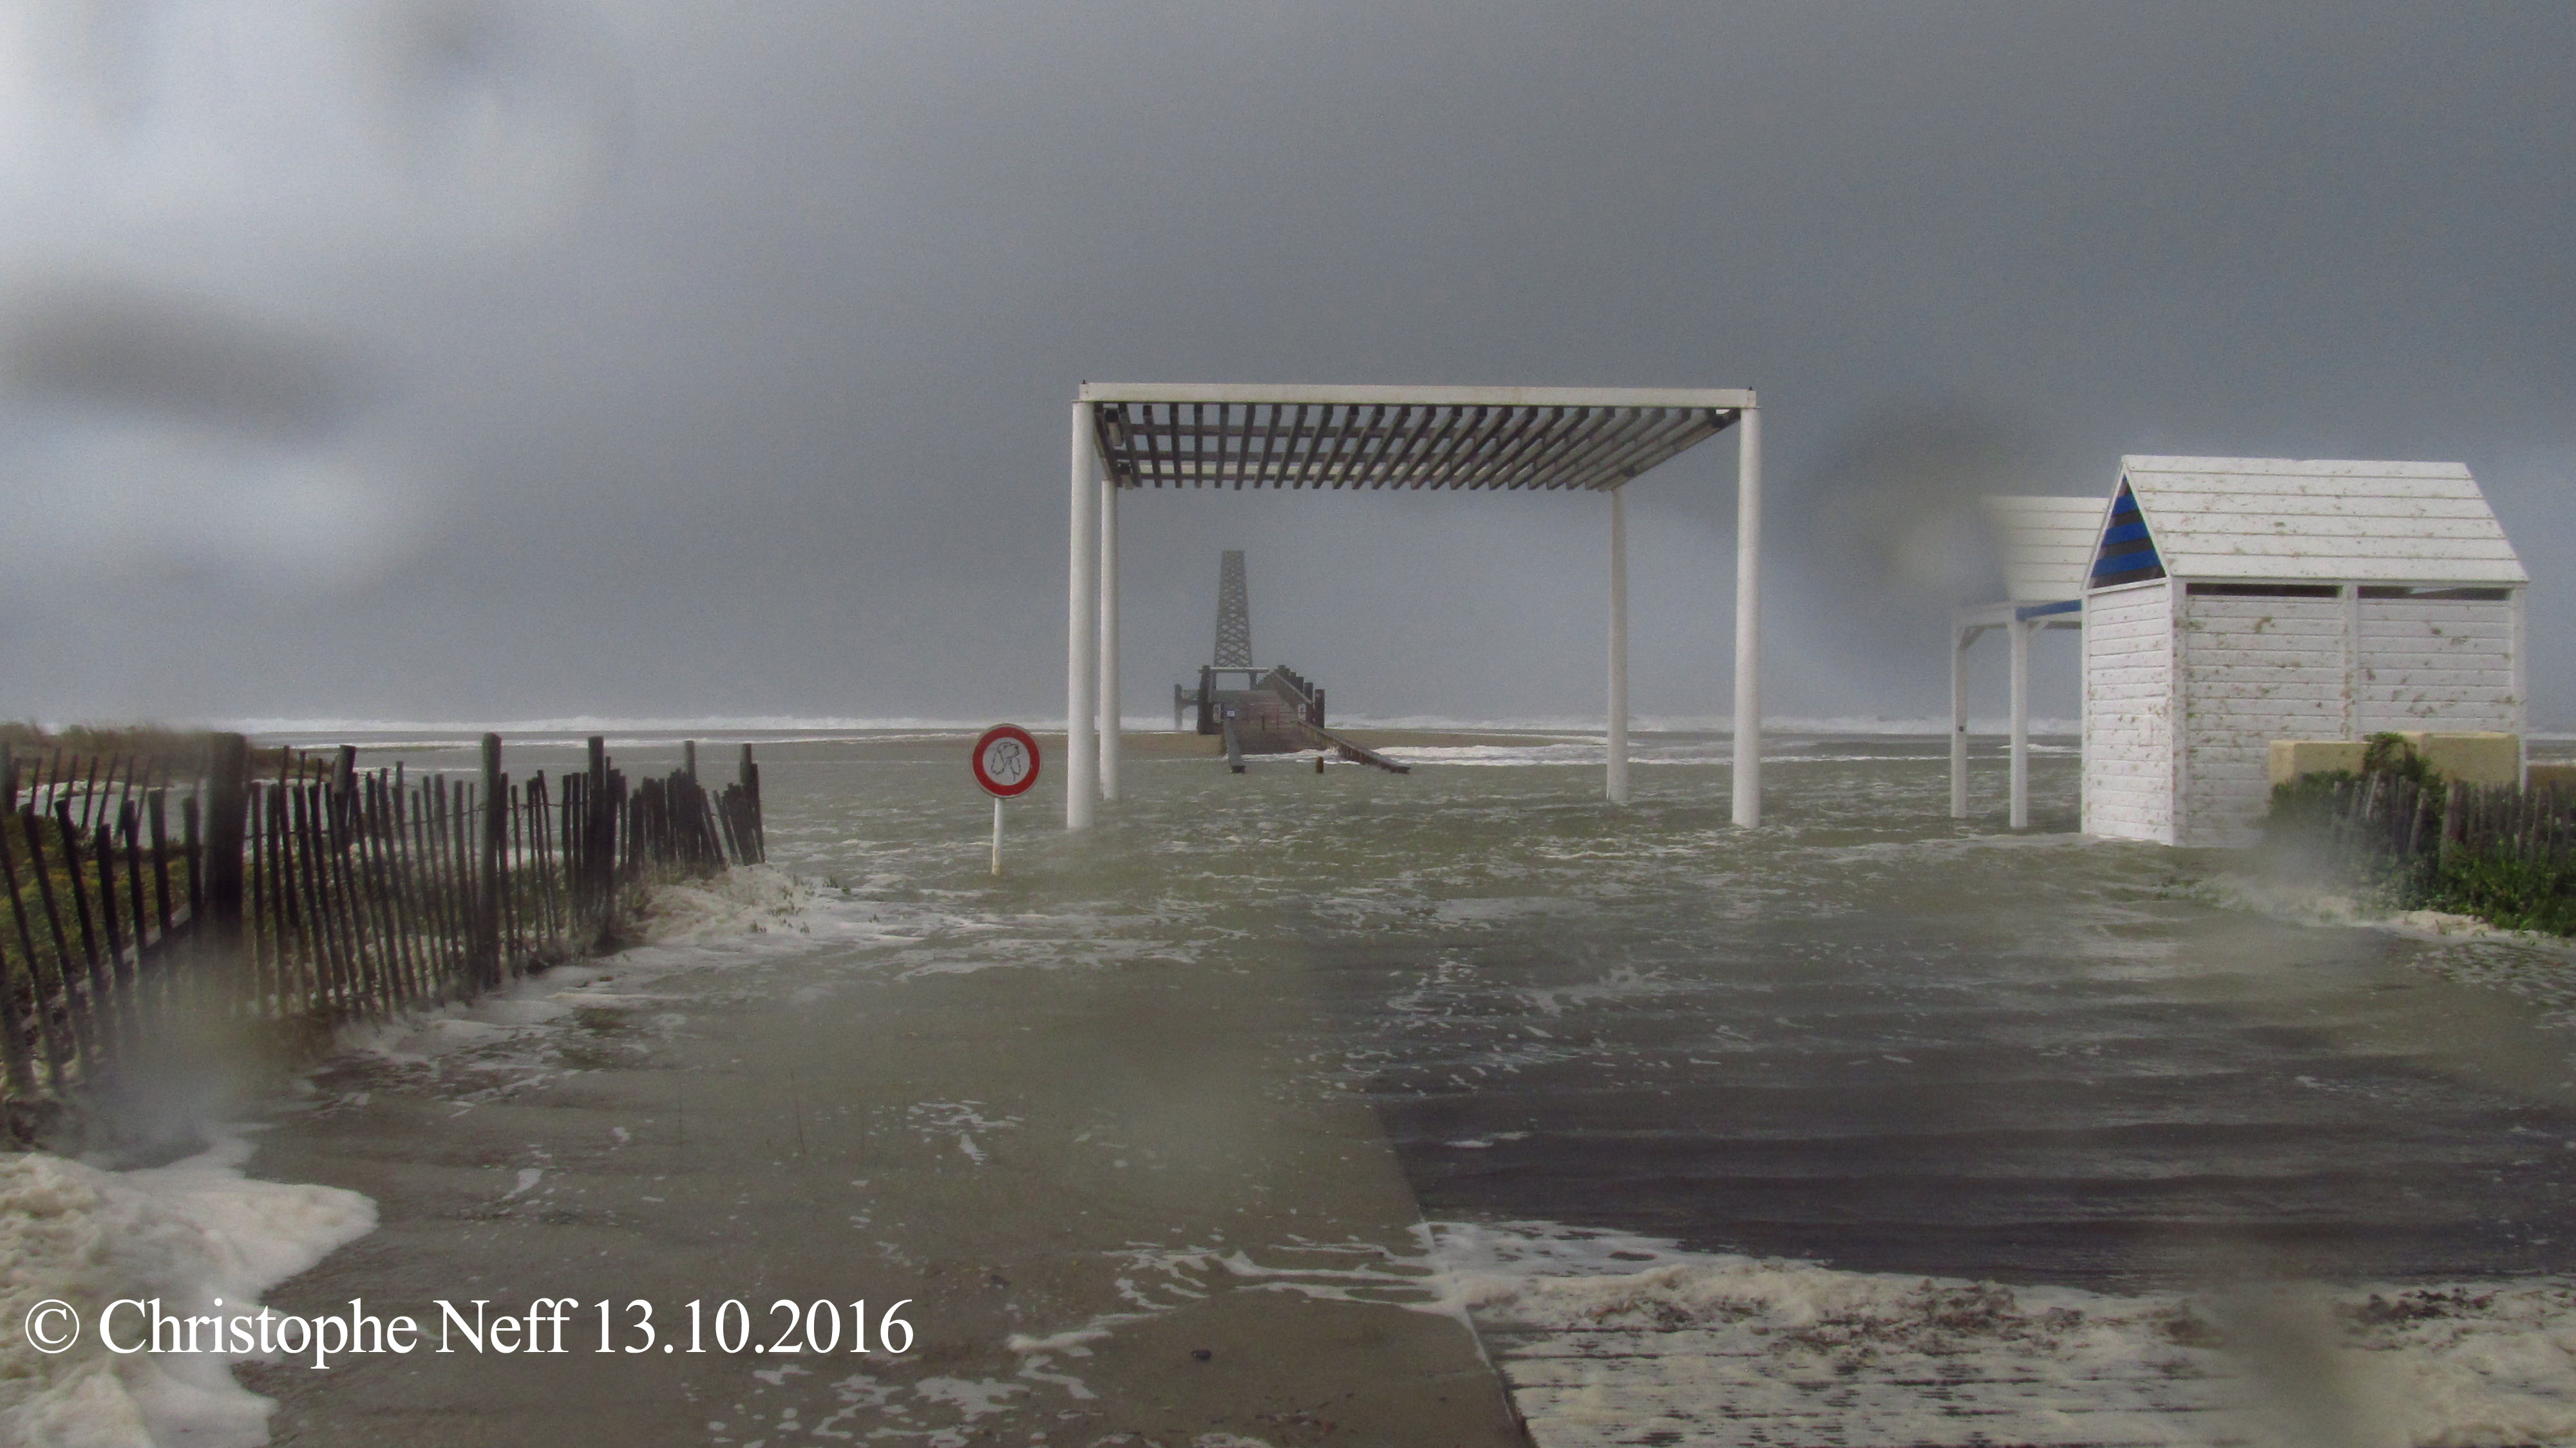 Port Leucate, le ponton 13.10.2016 vers 15H46